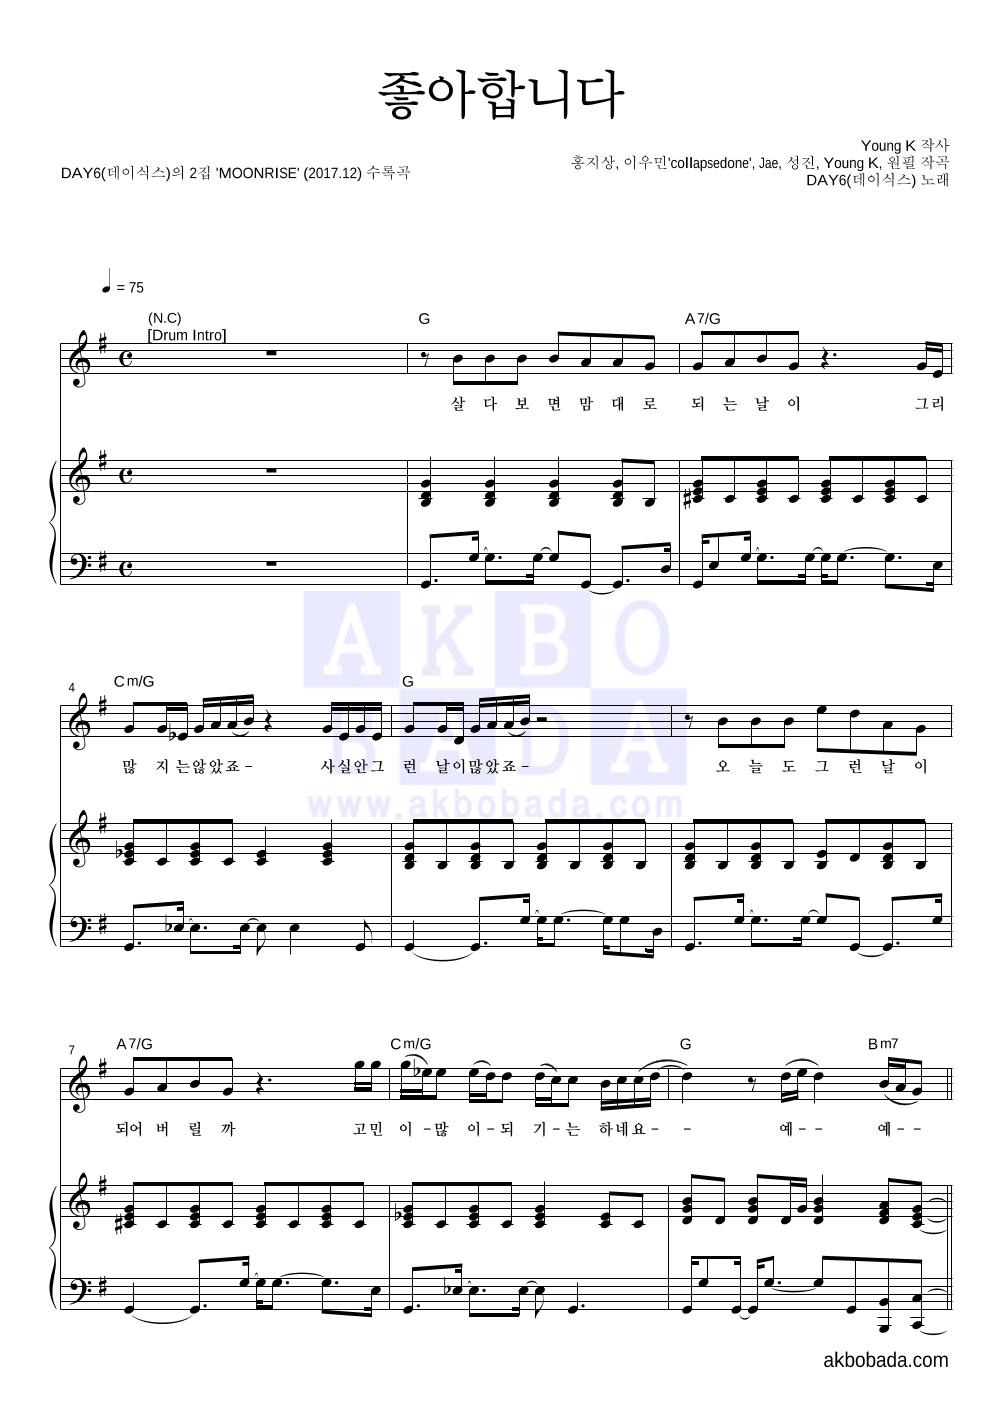 DAY6 - 좋아합니다 피아노 3단 악보